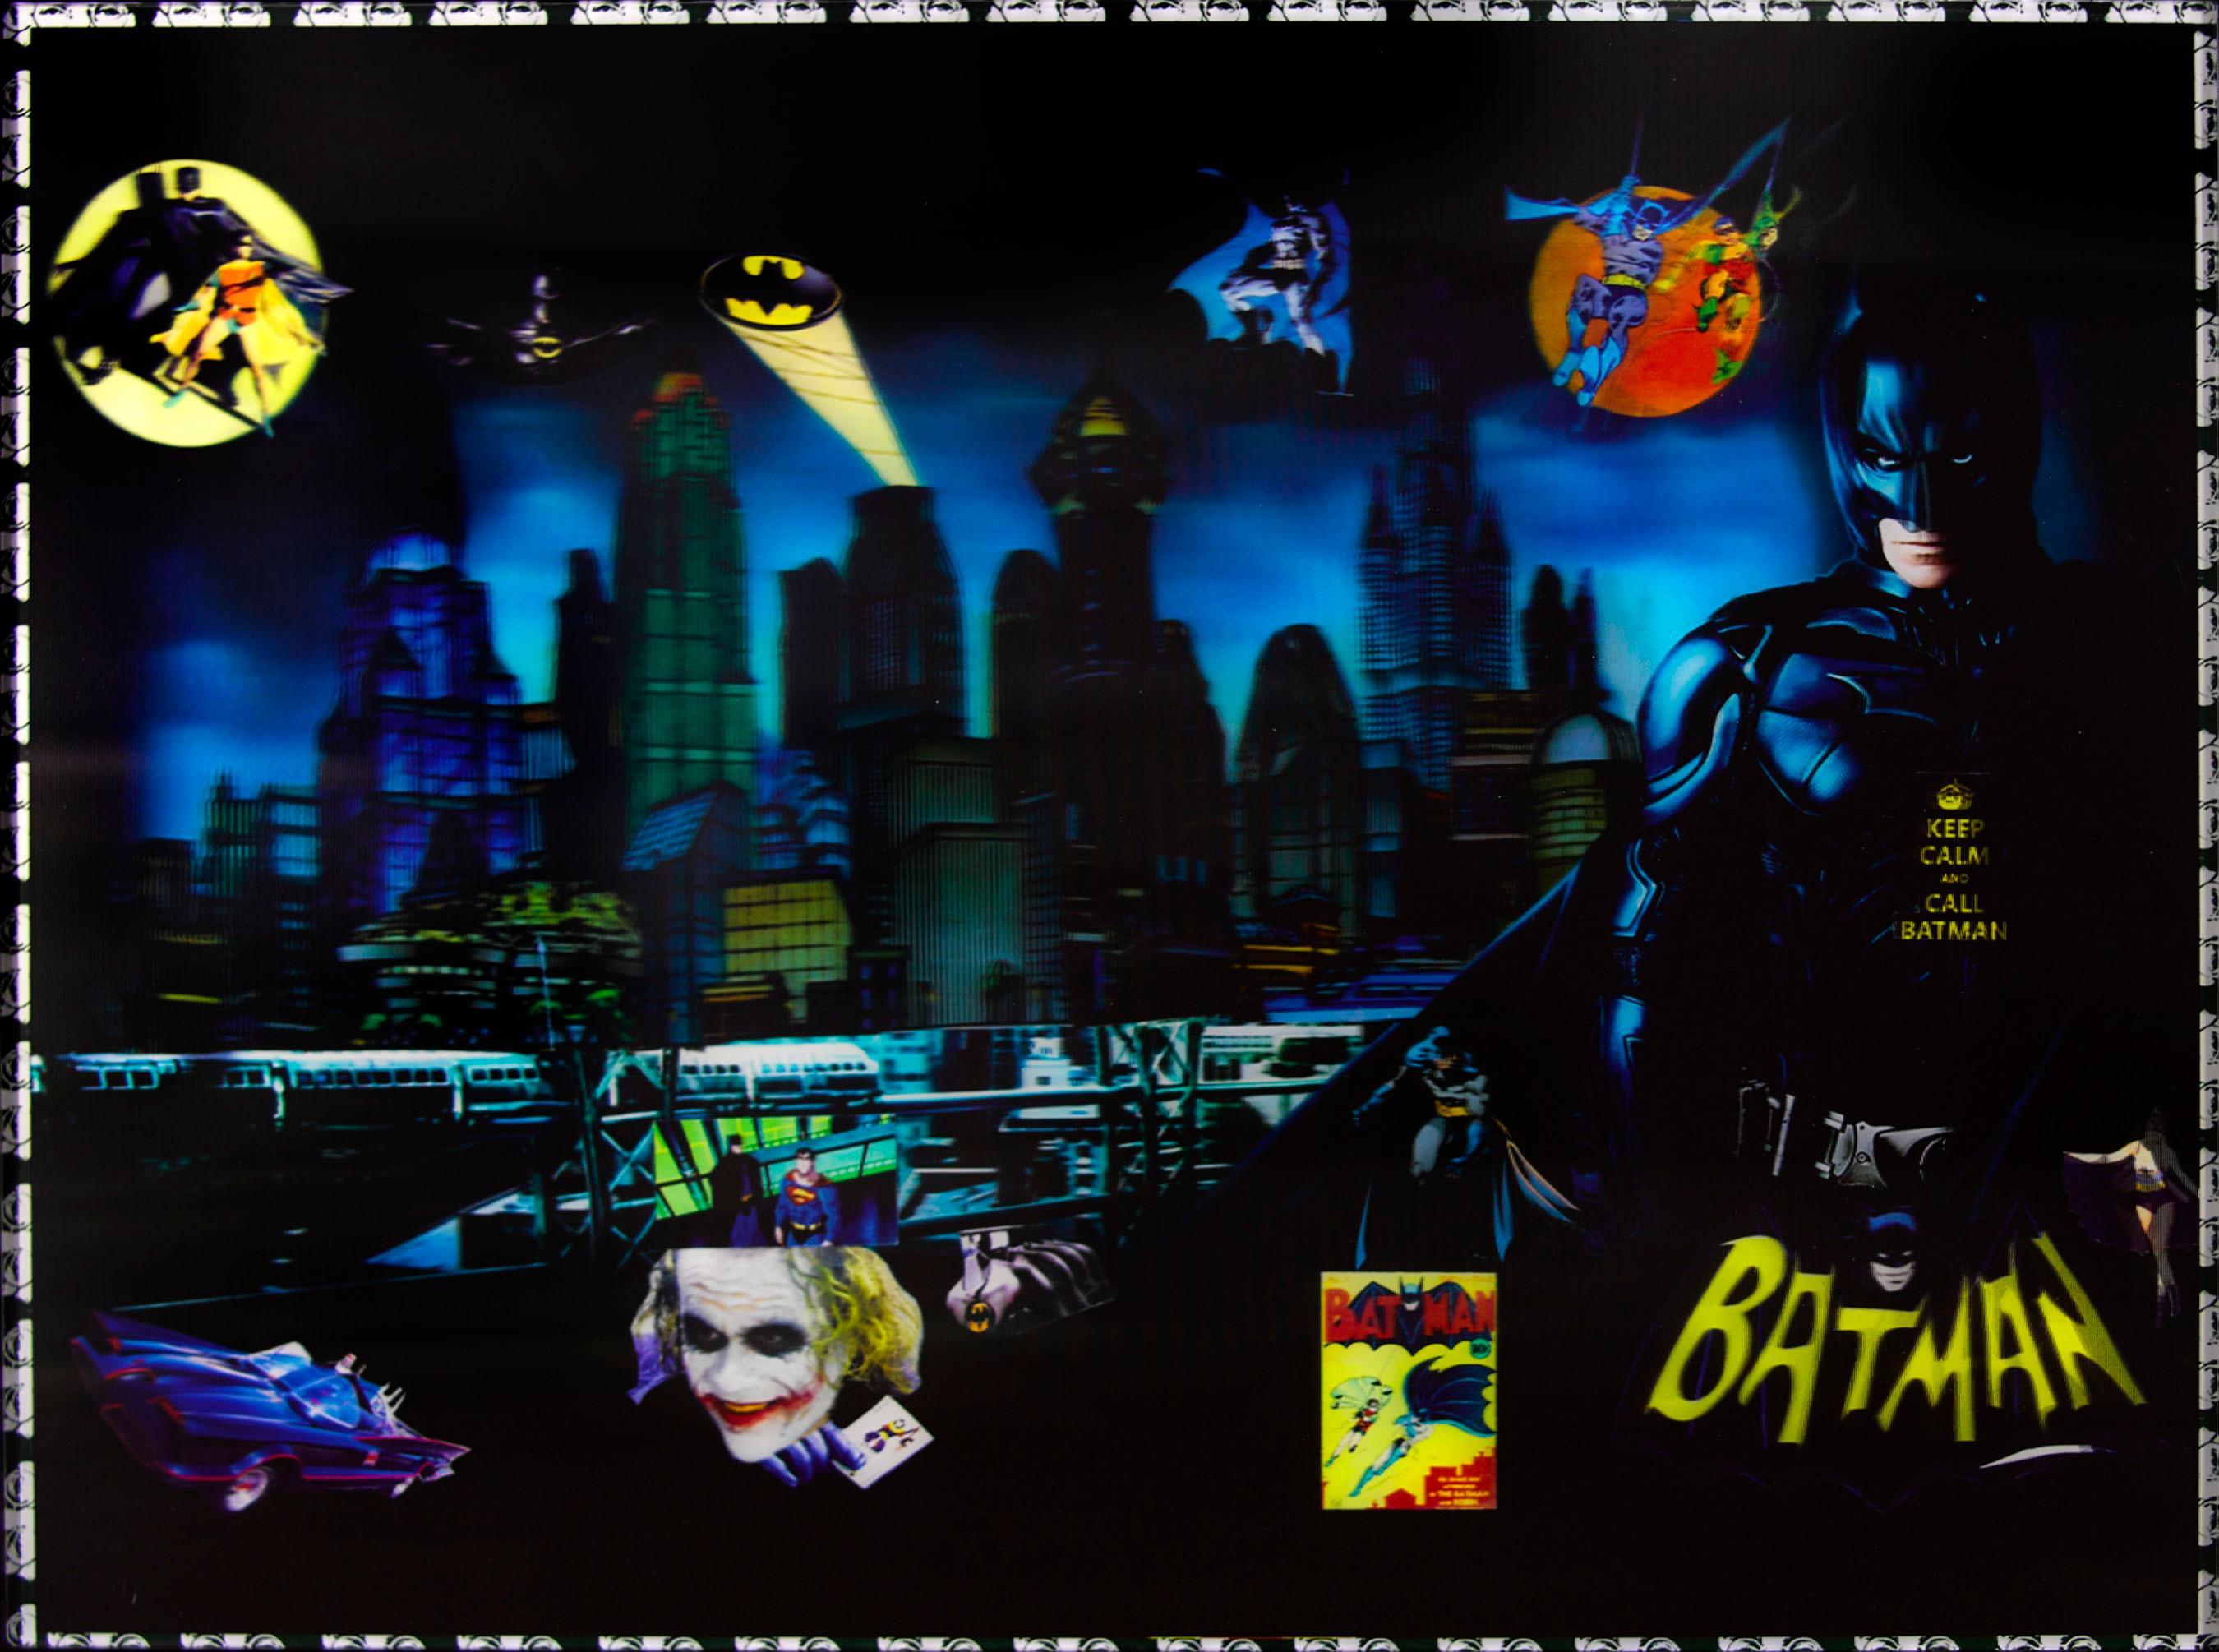 Batman in Gotham, 3D Backlit Digital Print by DJ Leon, 28 x 45 in